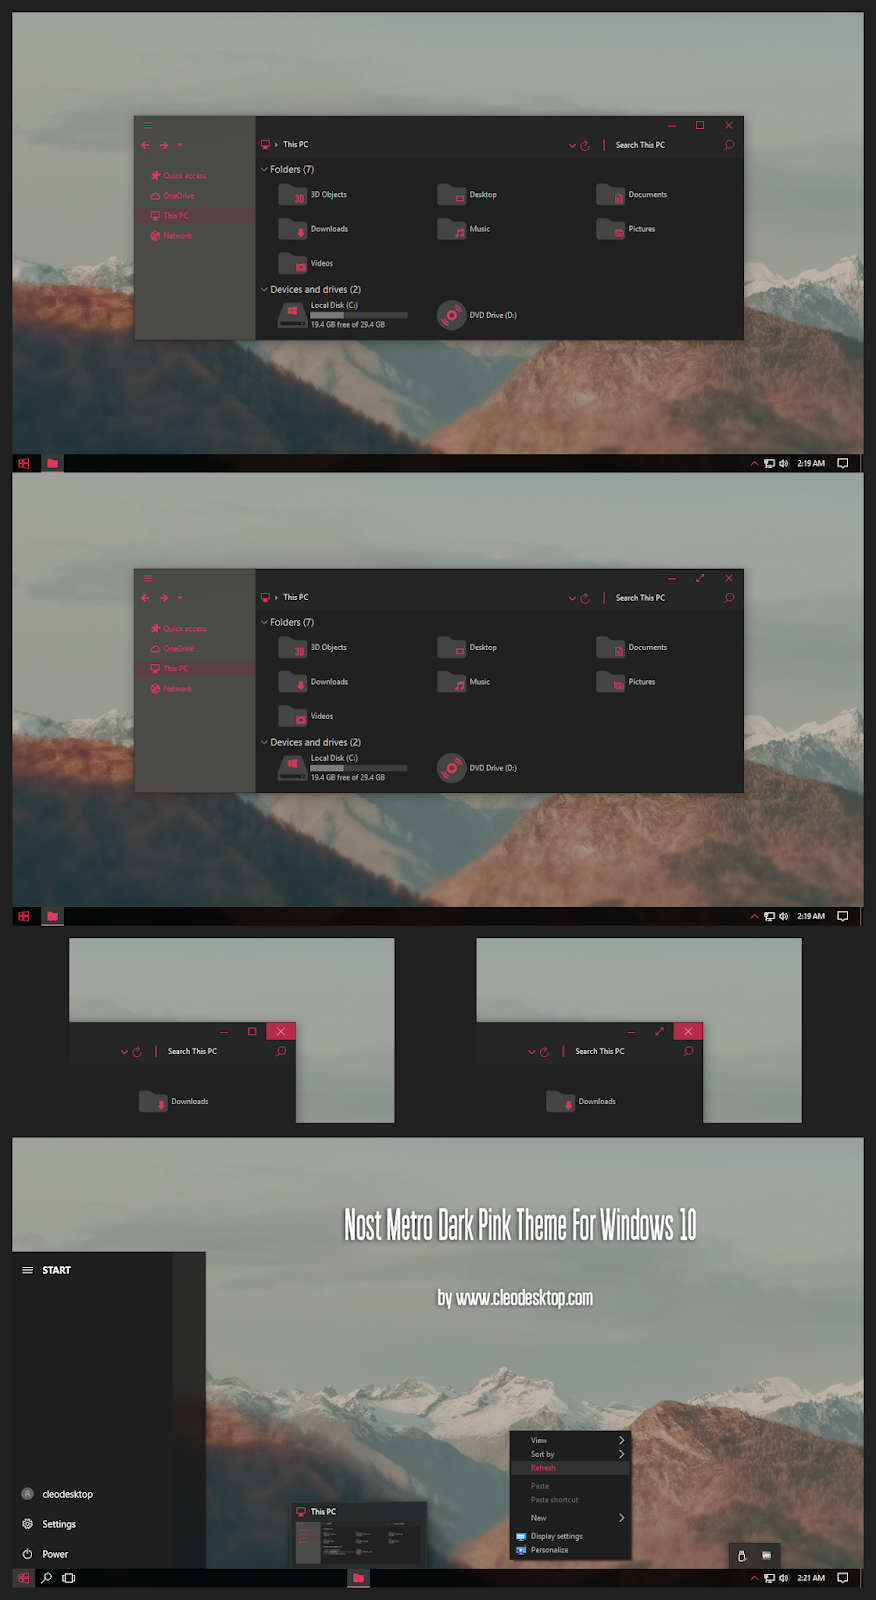 Nost Metro Dark Pink Theme Windows10 May 2019 Update 1903